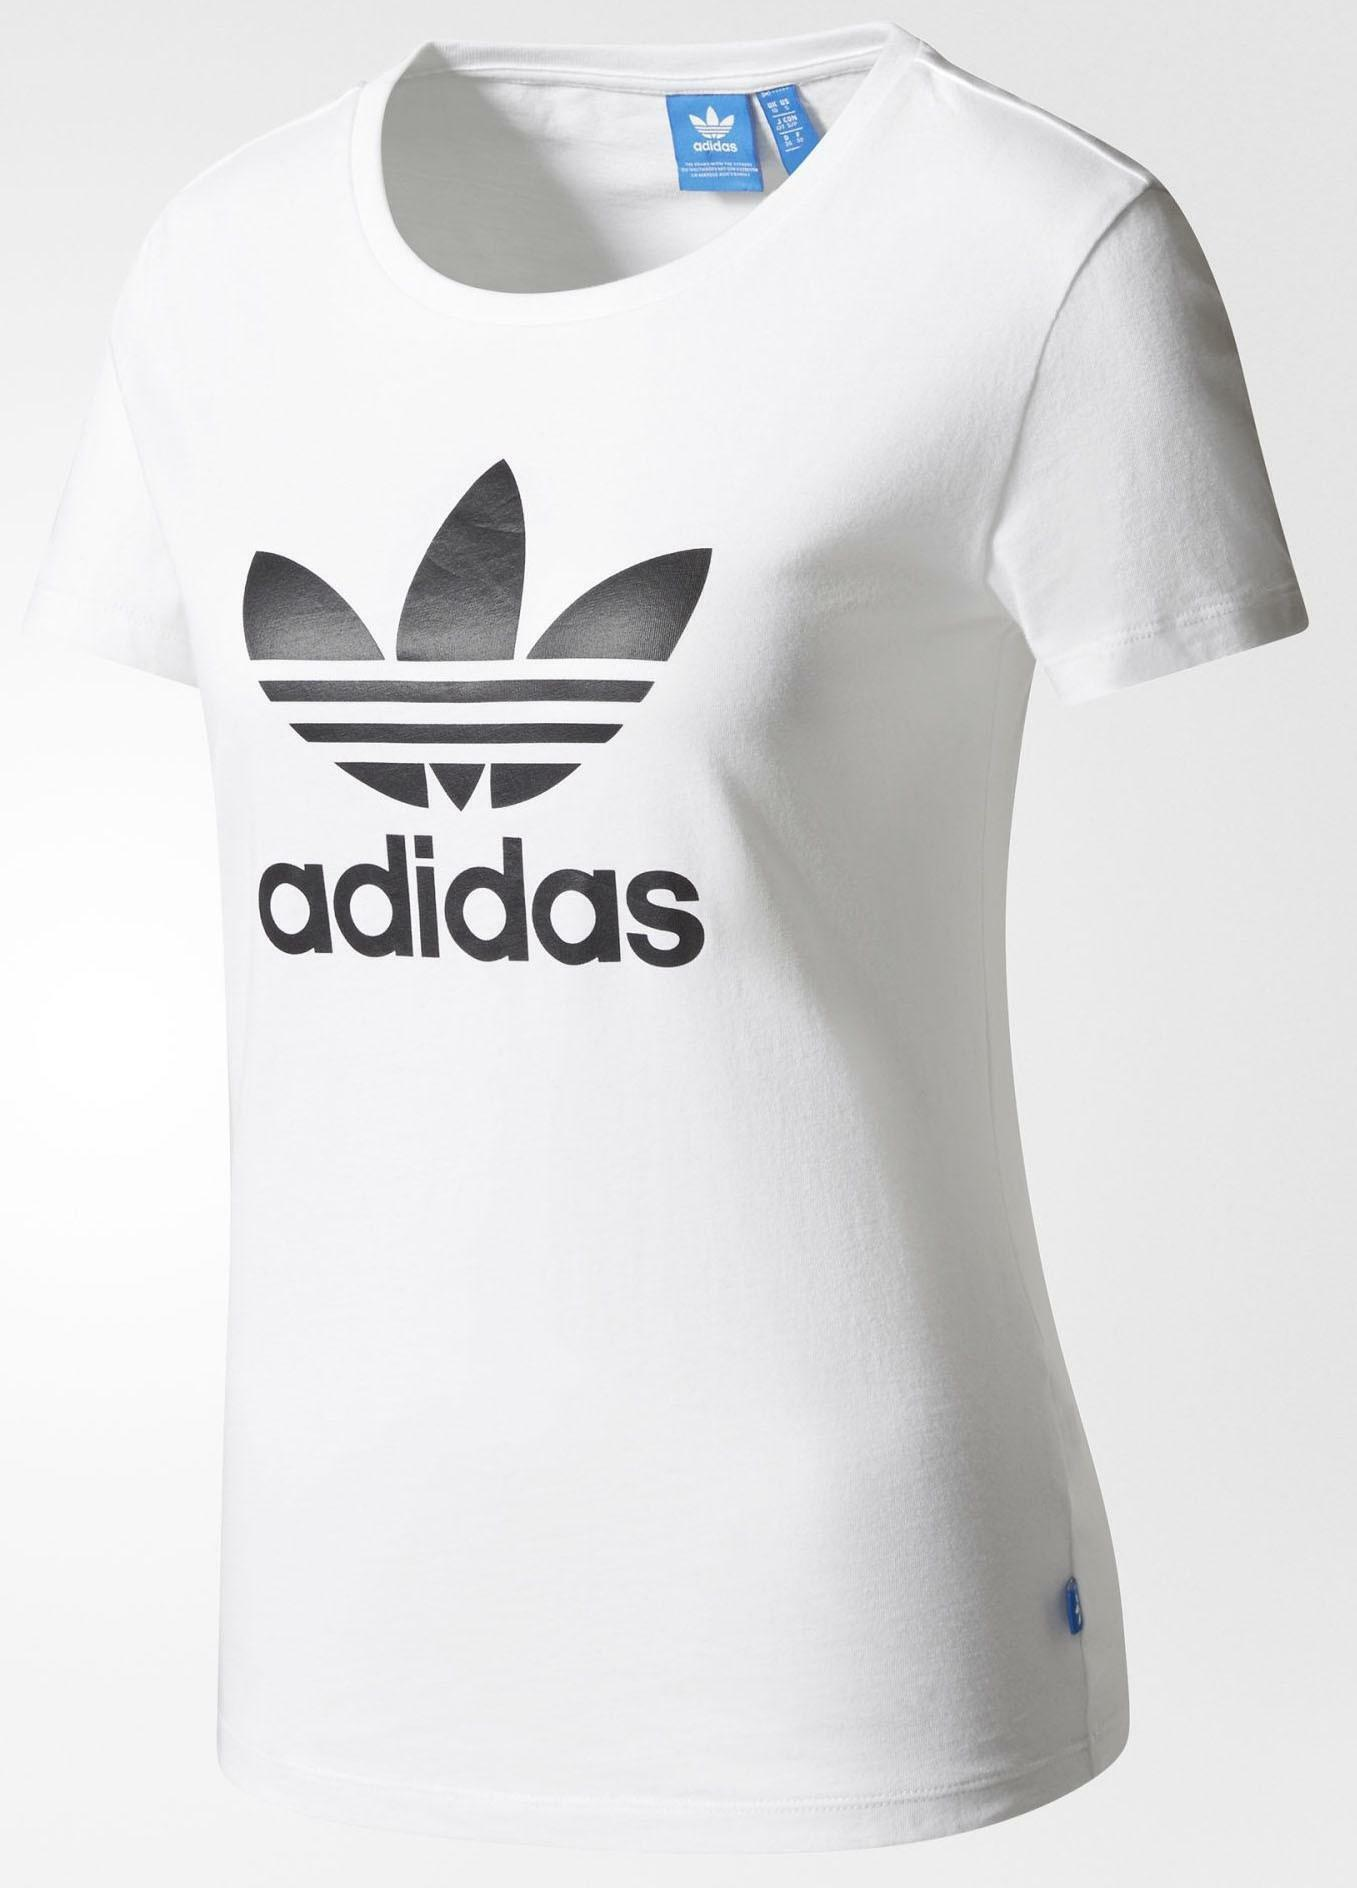 5fae51d31159 T Donna Adidas Trefoil Tee Bianca Shirt WEIbe9DY2H